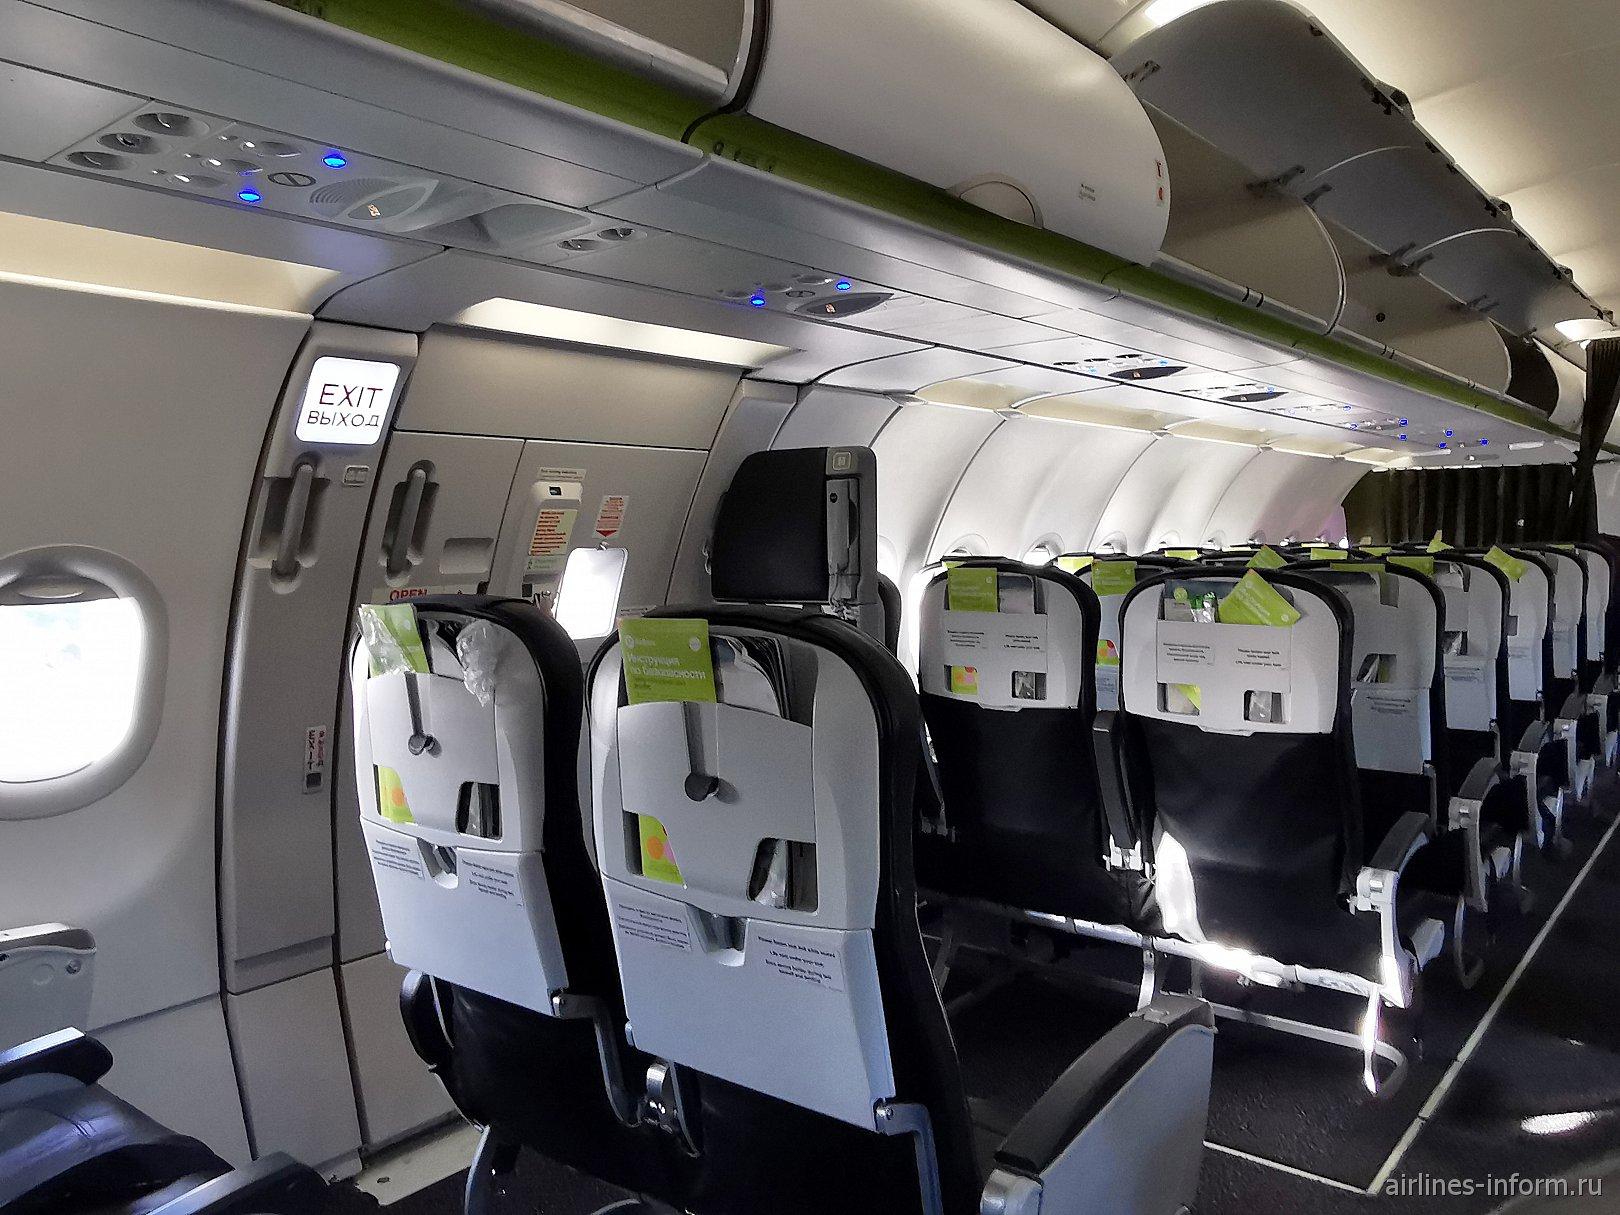 Пассажирский салон эконом-класса в авиалайнере Airbus A321neo авиакомпании S7 Airlines